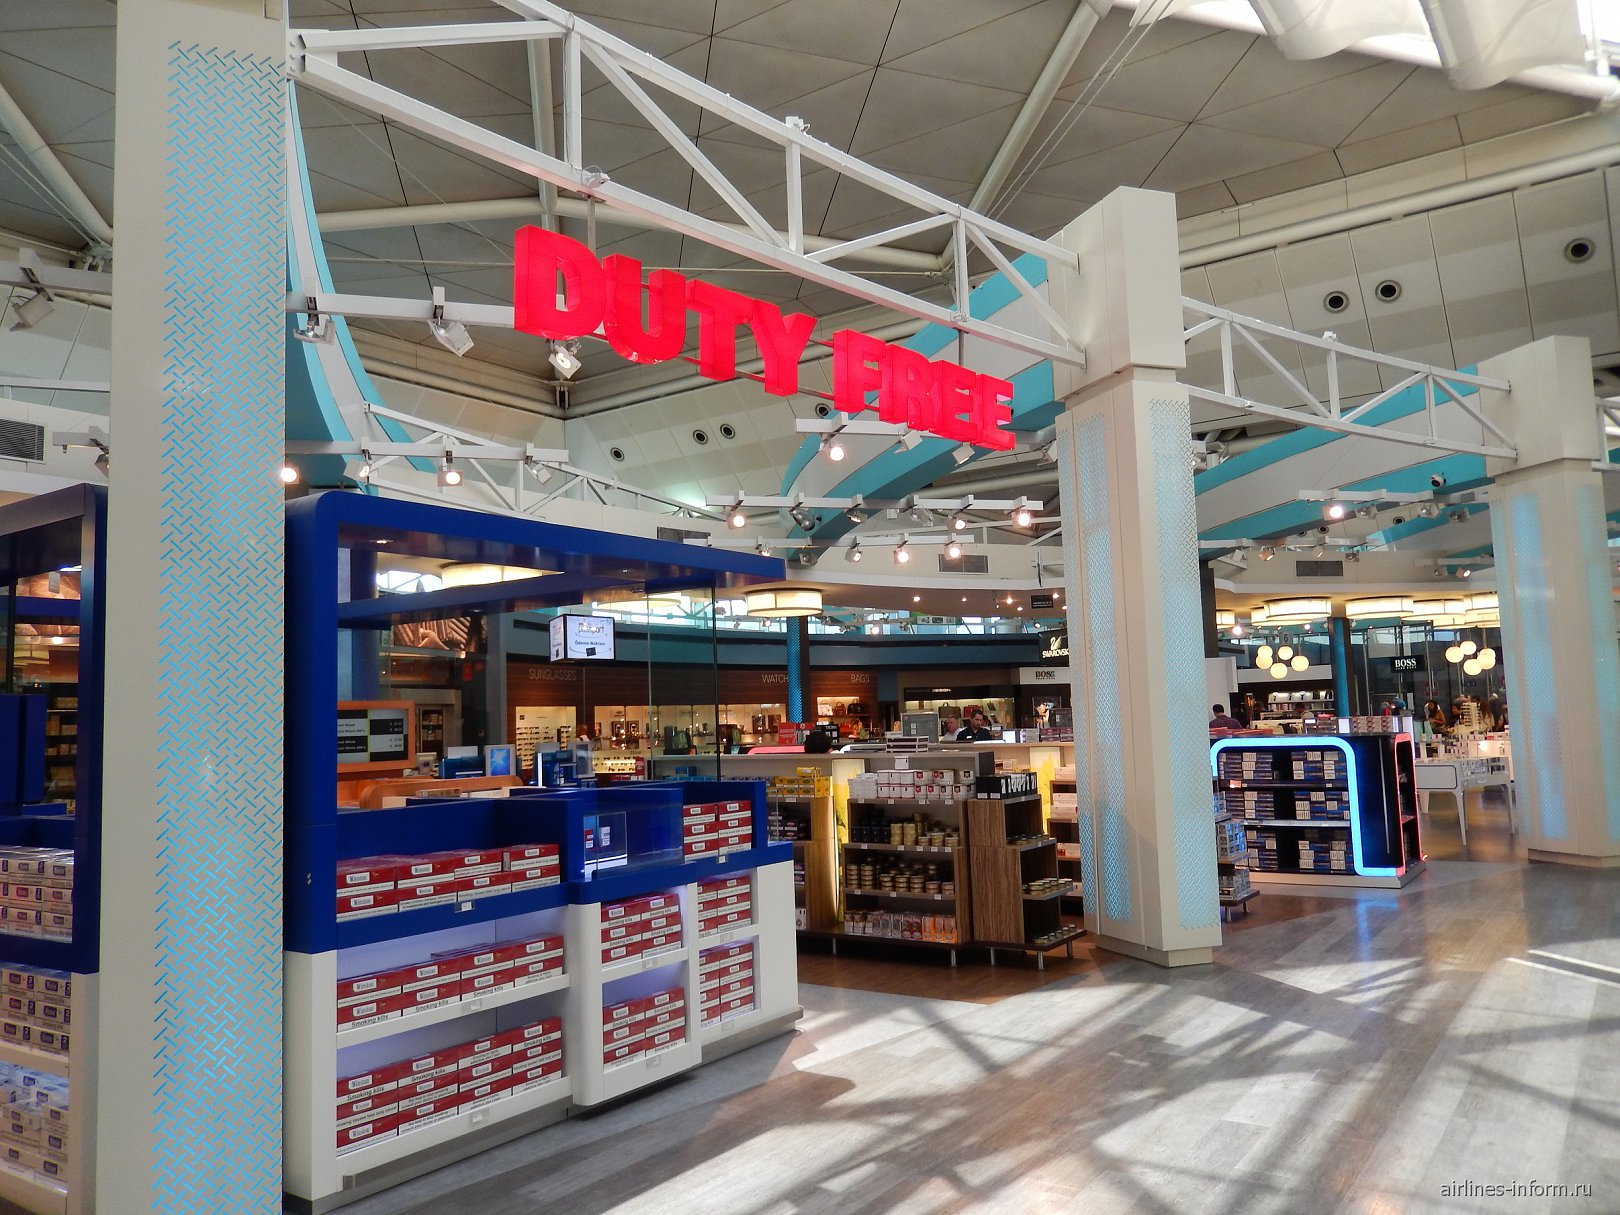 Магазин Duty-free в аэропорту Стамбул Ататюрк